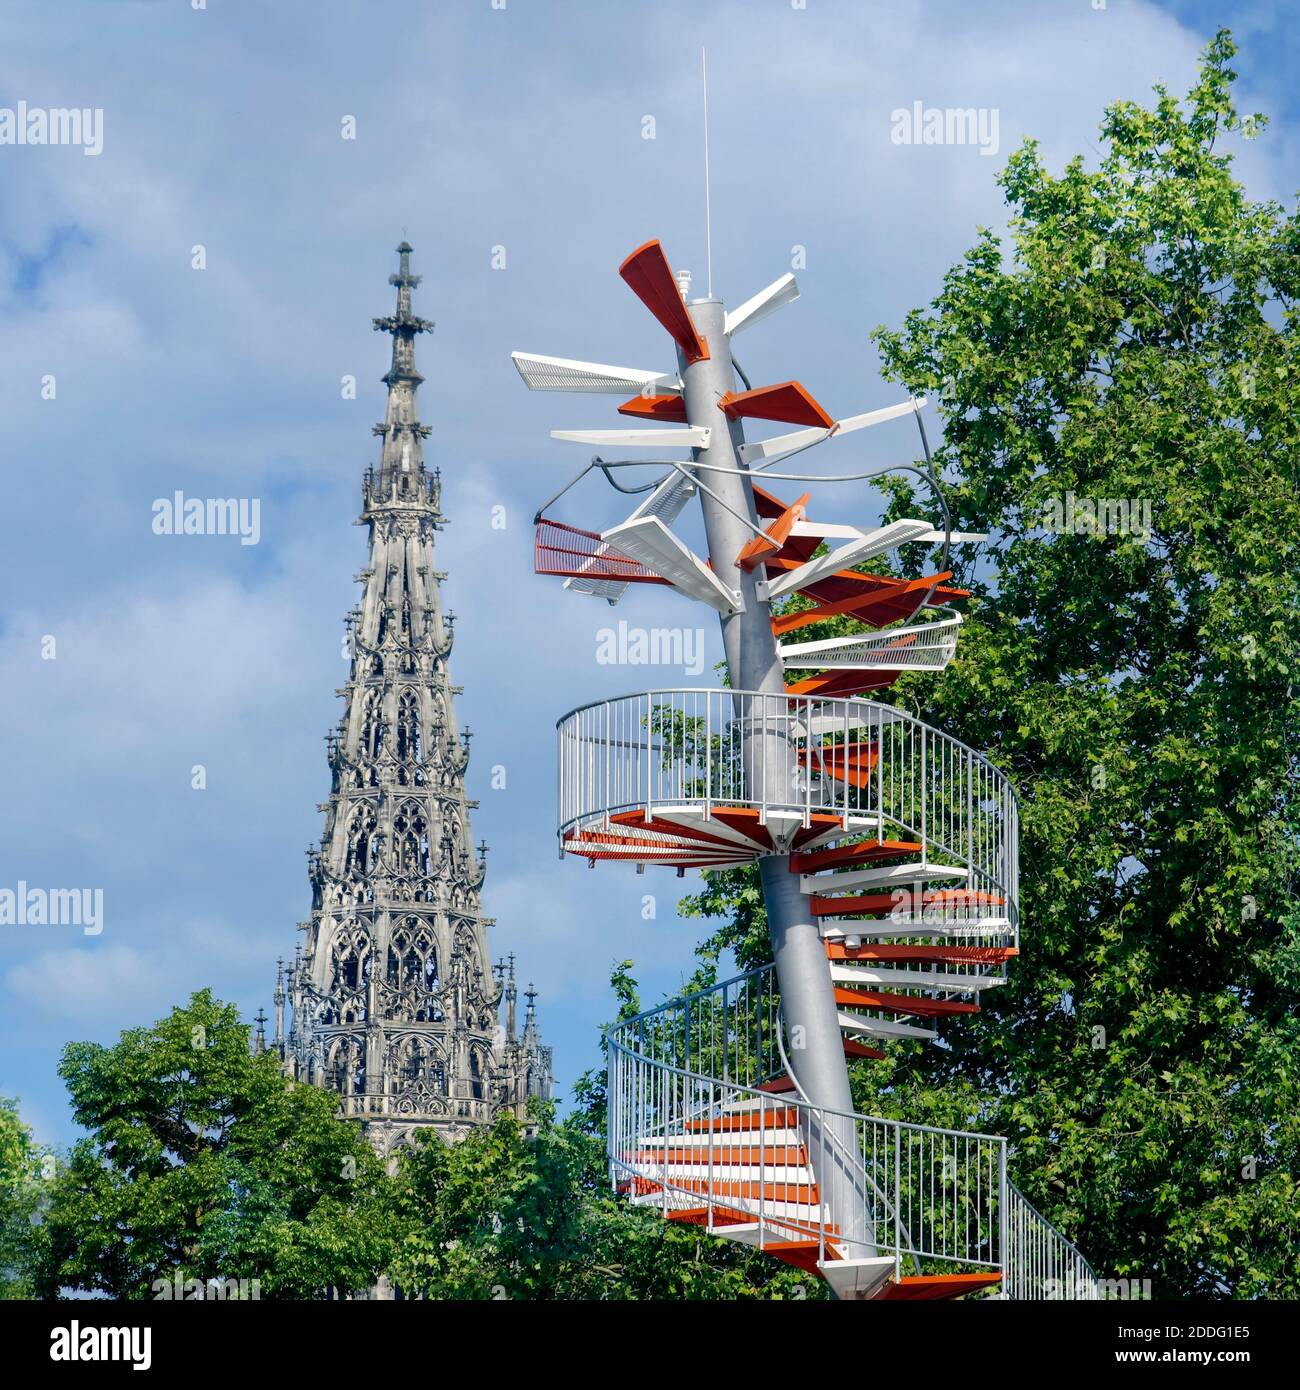 Ulmer Berblinger Turm neben dem Ulmer Münster Stockfoto